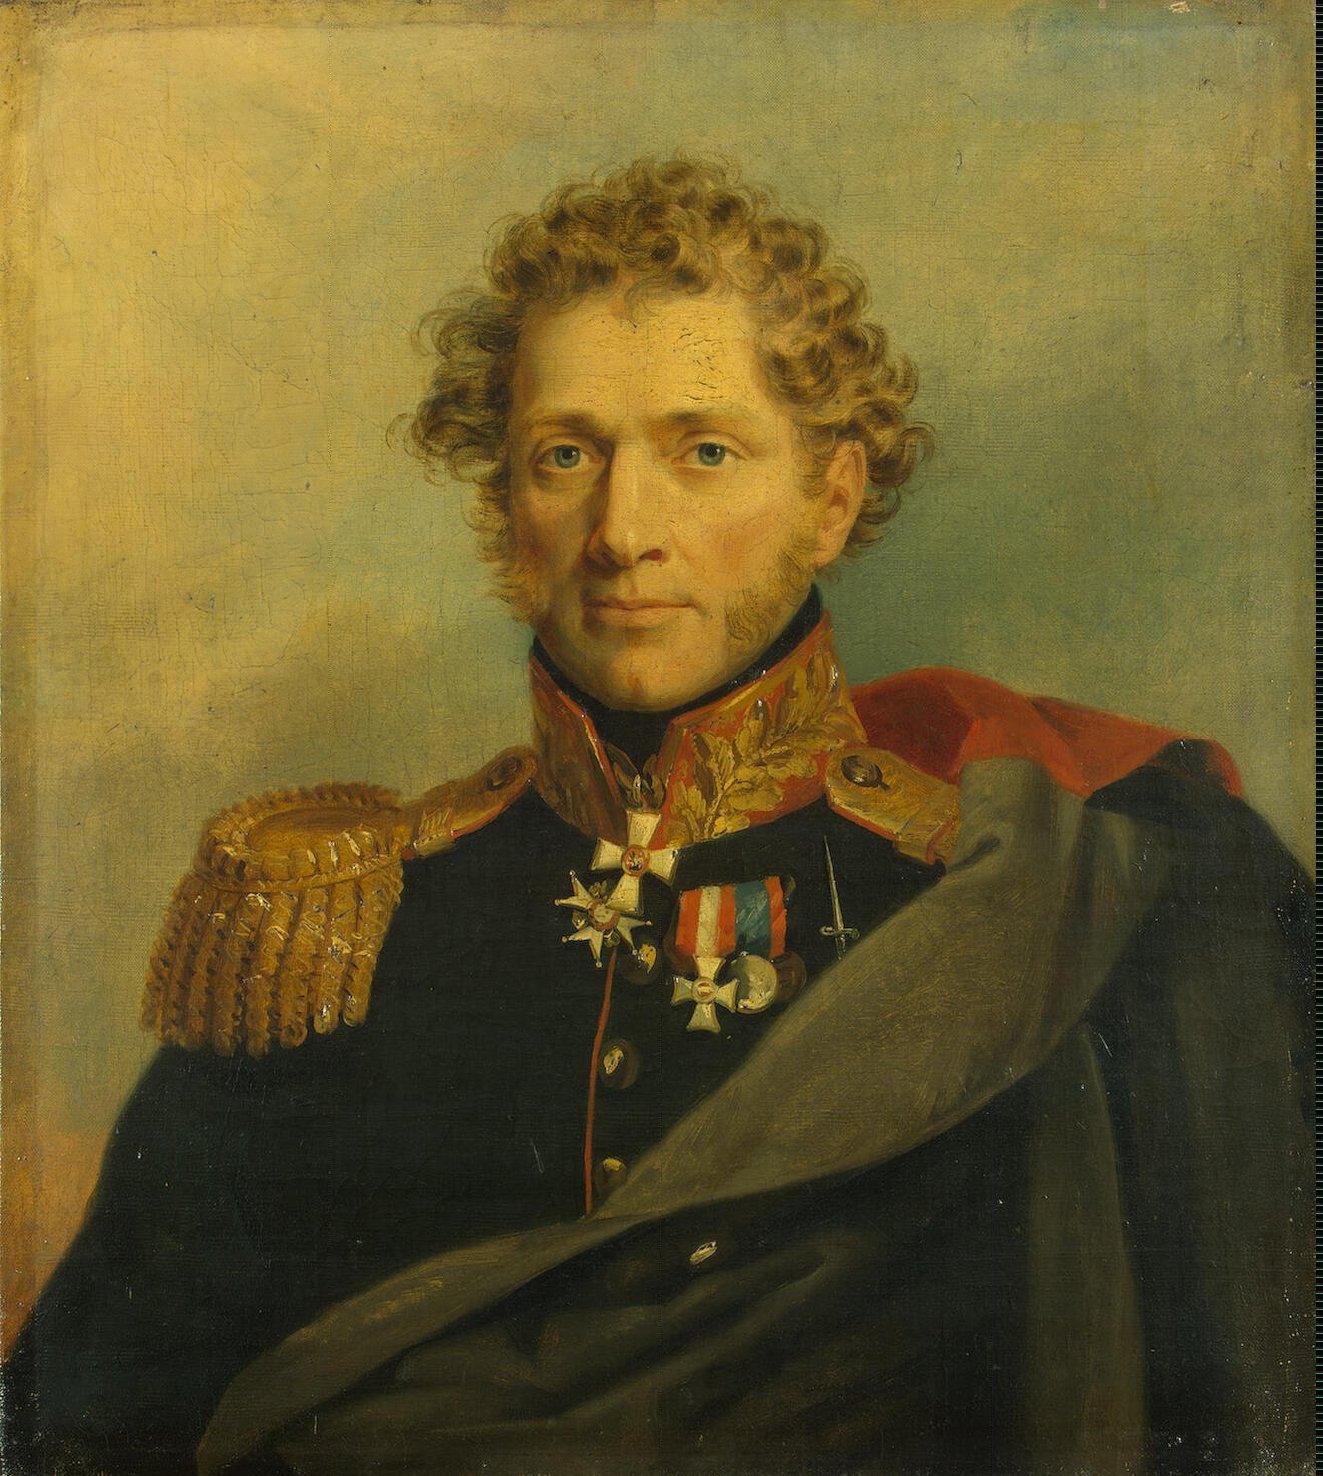 Вальмоден Людвиг